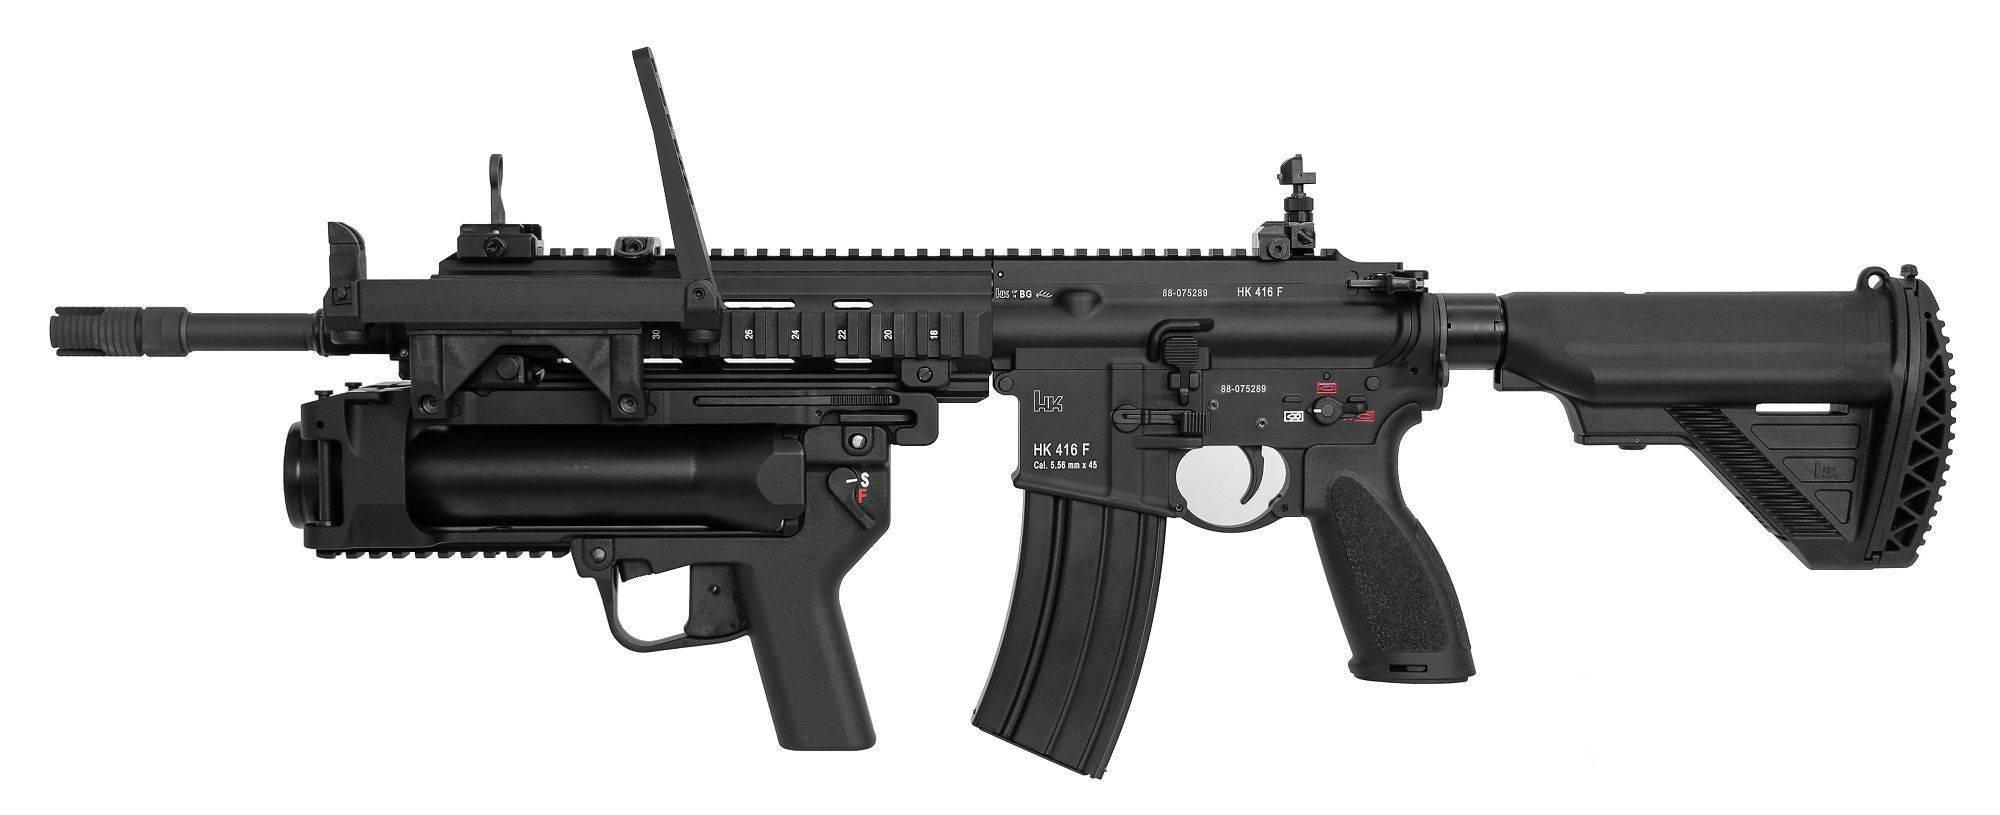 Штурмовая винтовка heckler & koch g3